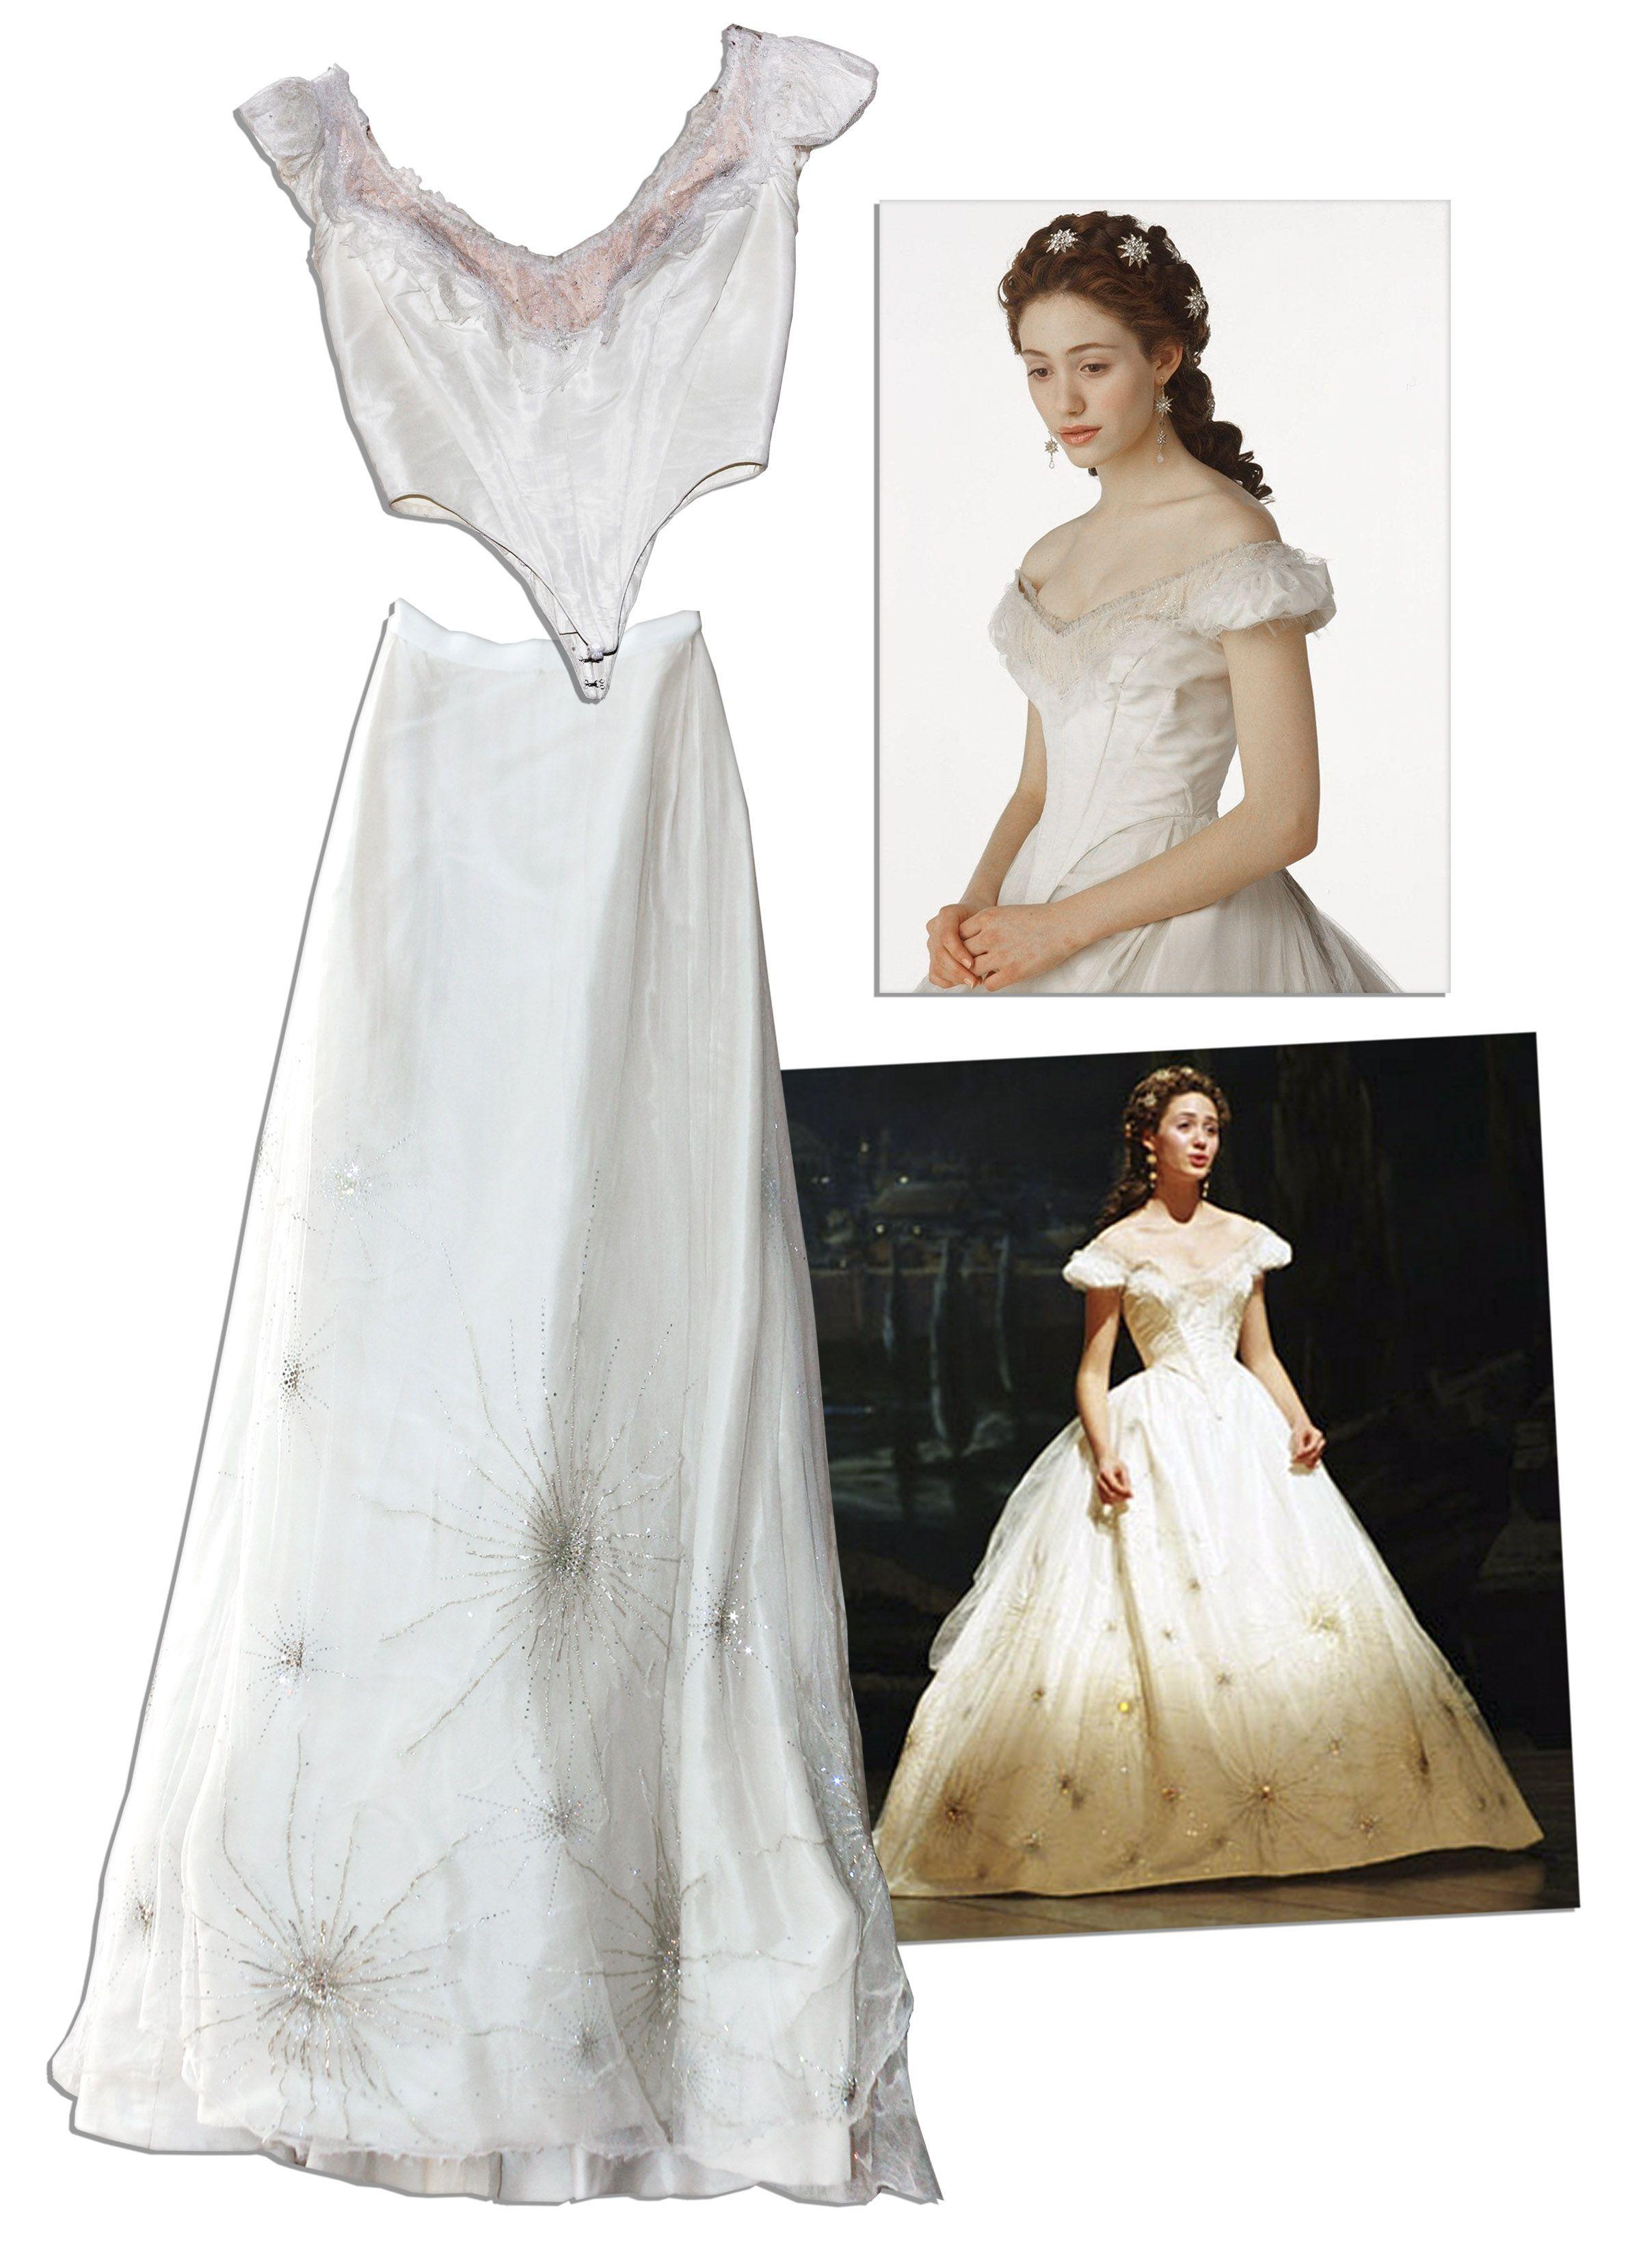 phantom of the opera wedding dress emmy - Google Search | Dresses ...